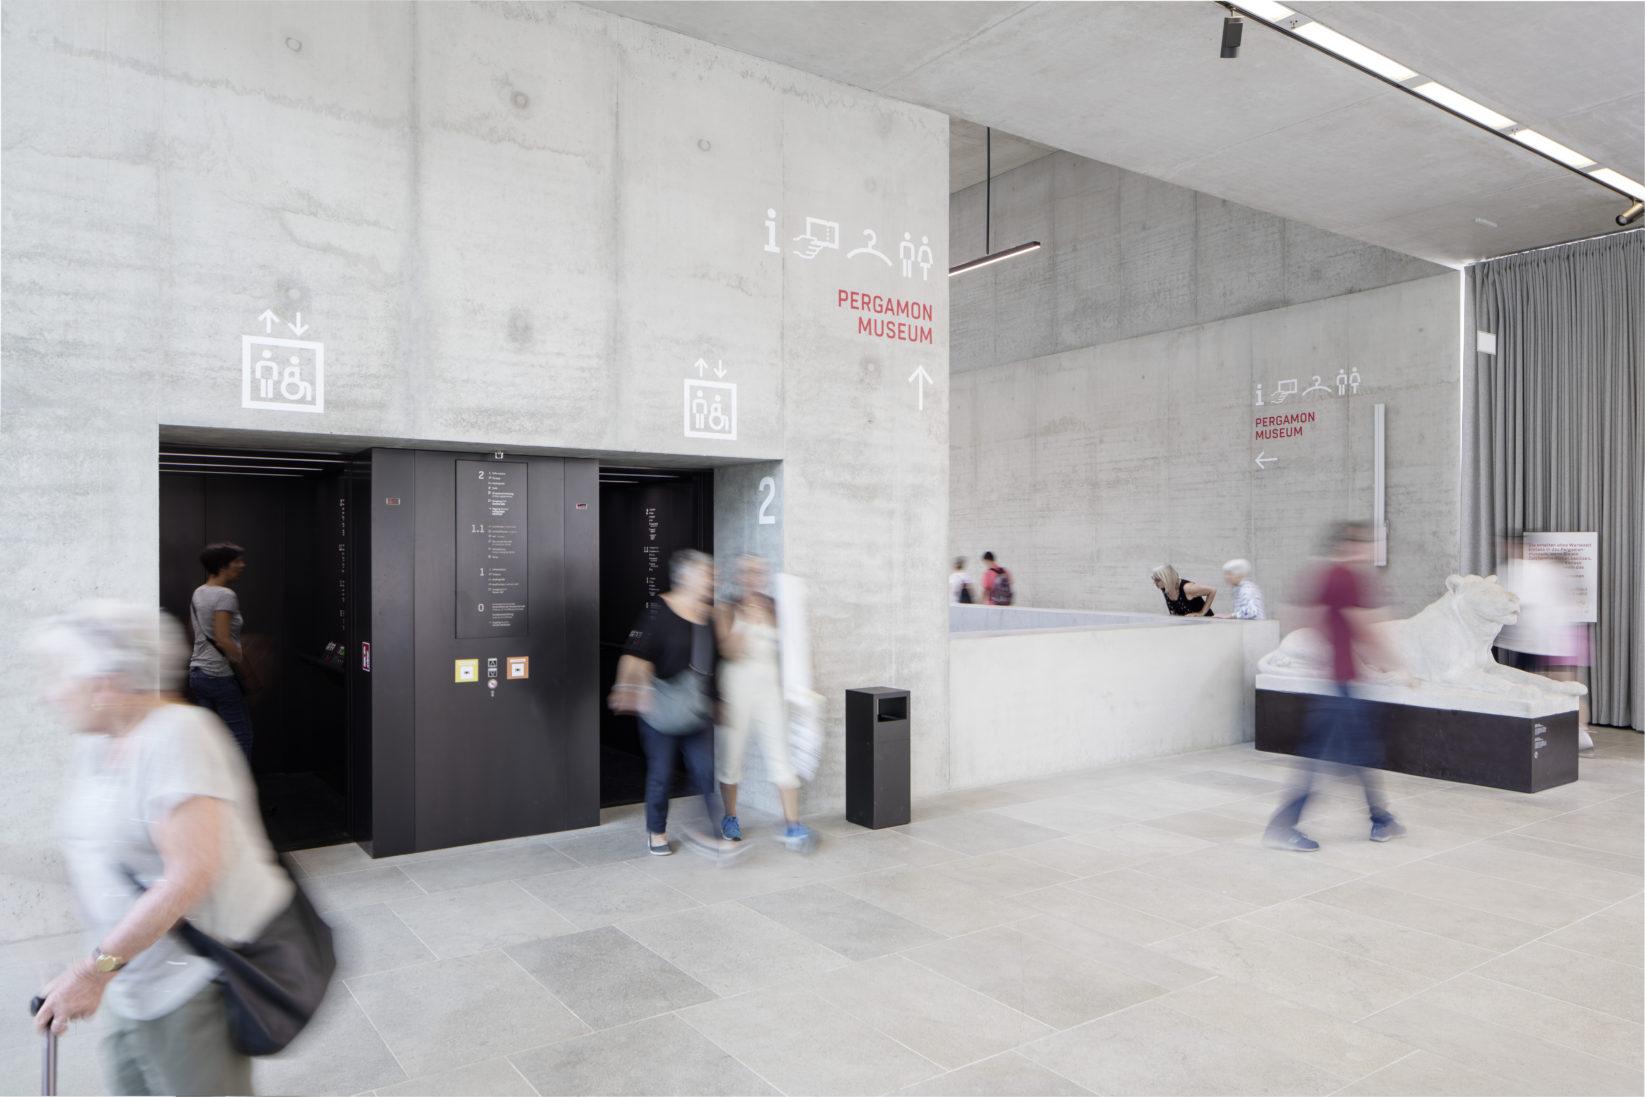 James-Simon-Galerie Leitsystem Wandtypografie Raumsituation